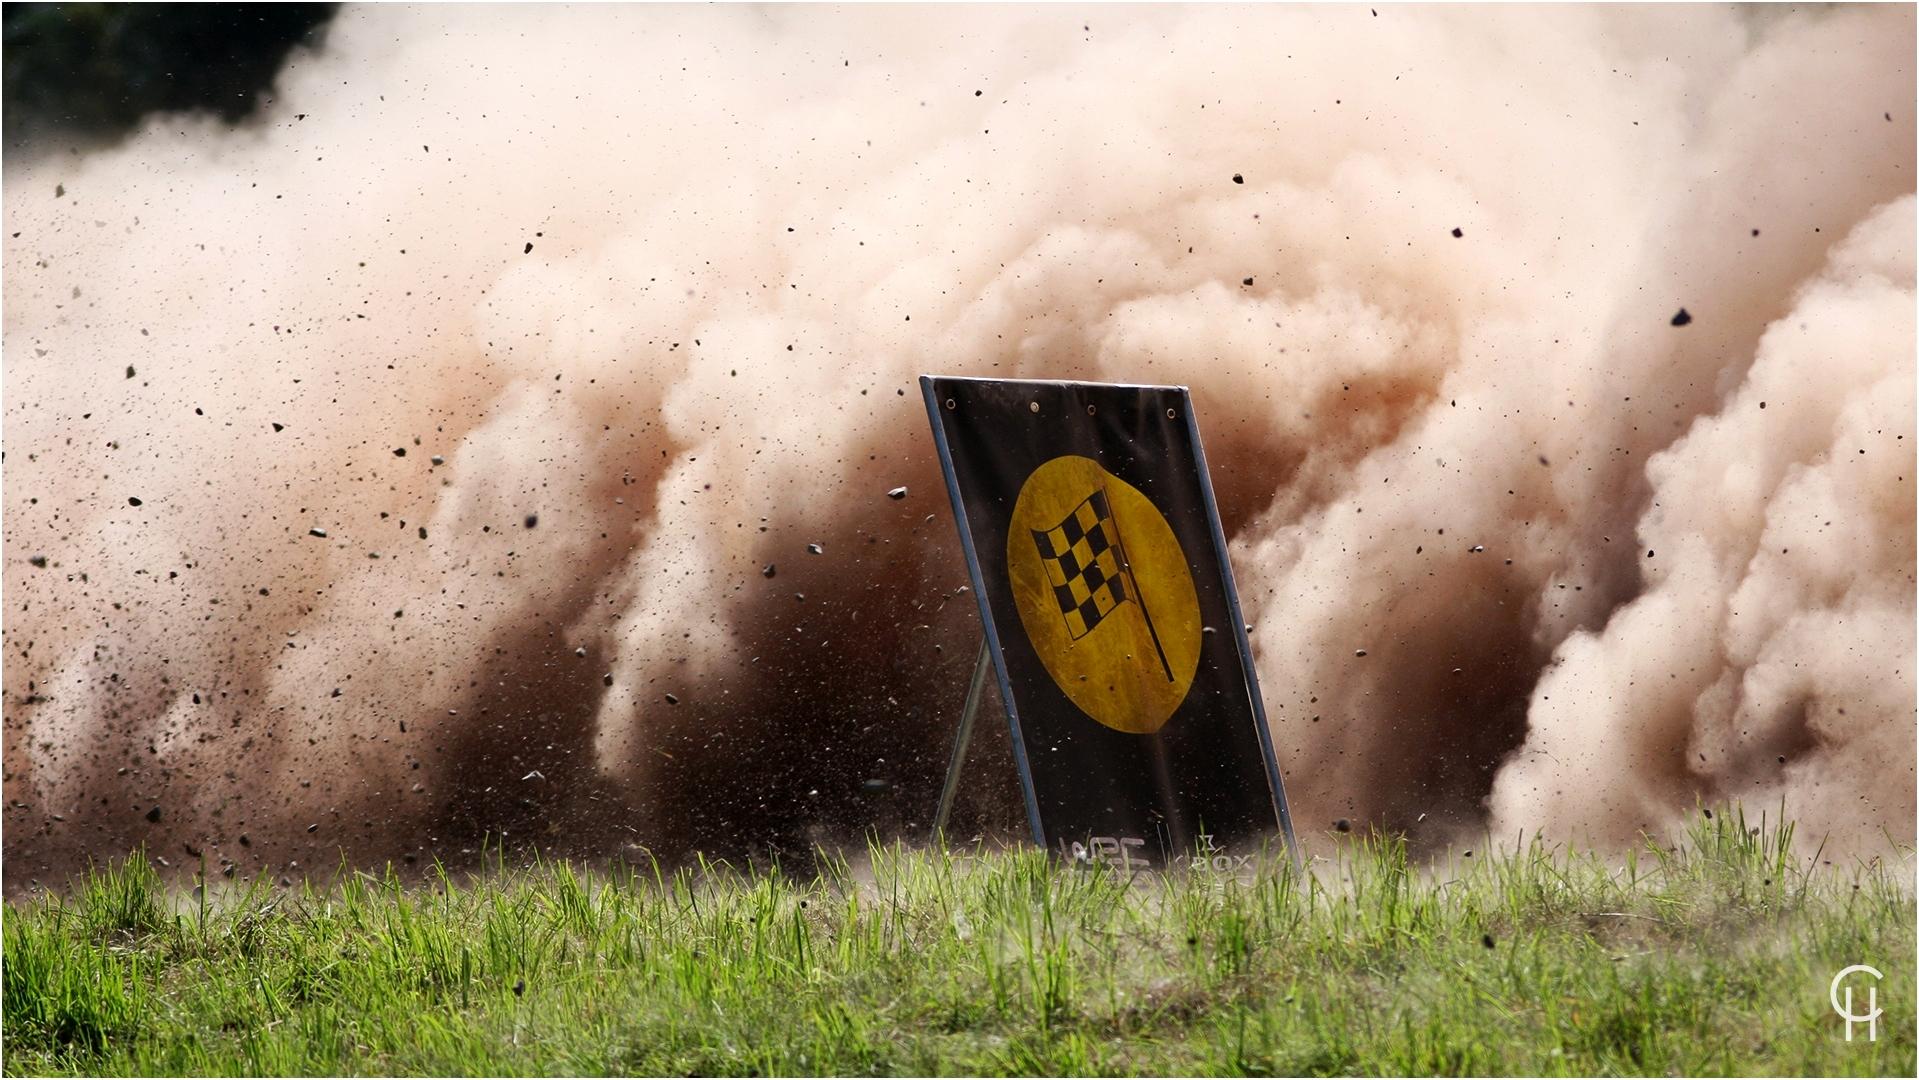 Rally Estonia 2020 - WRC is back